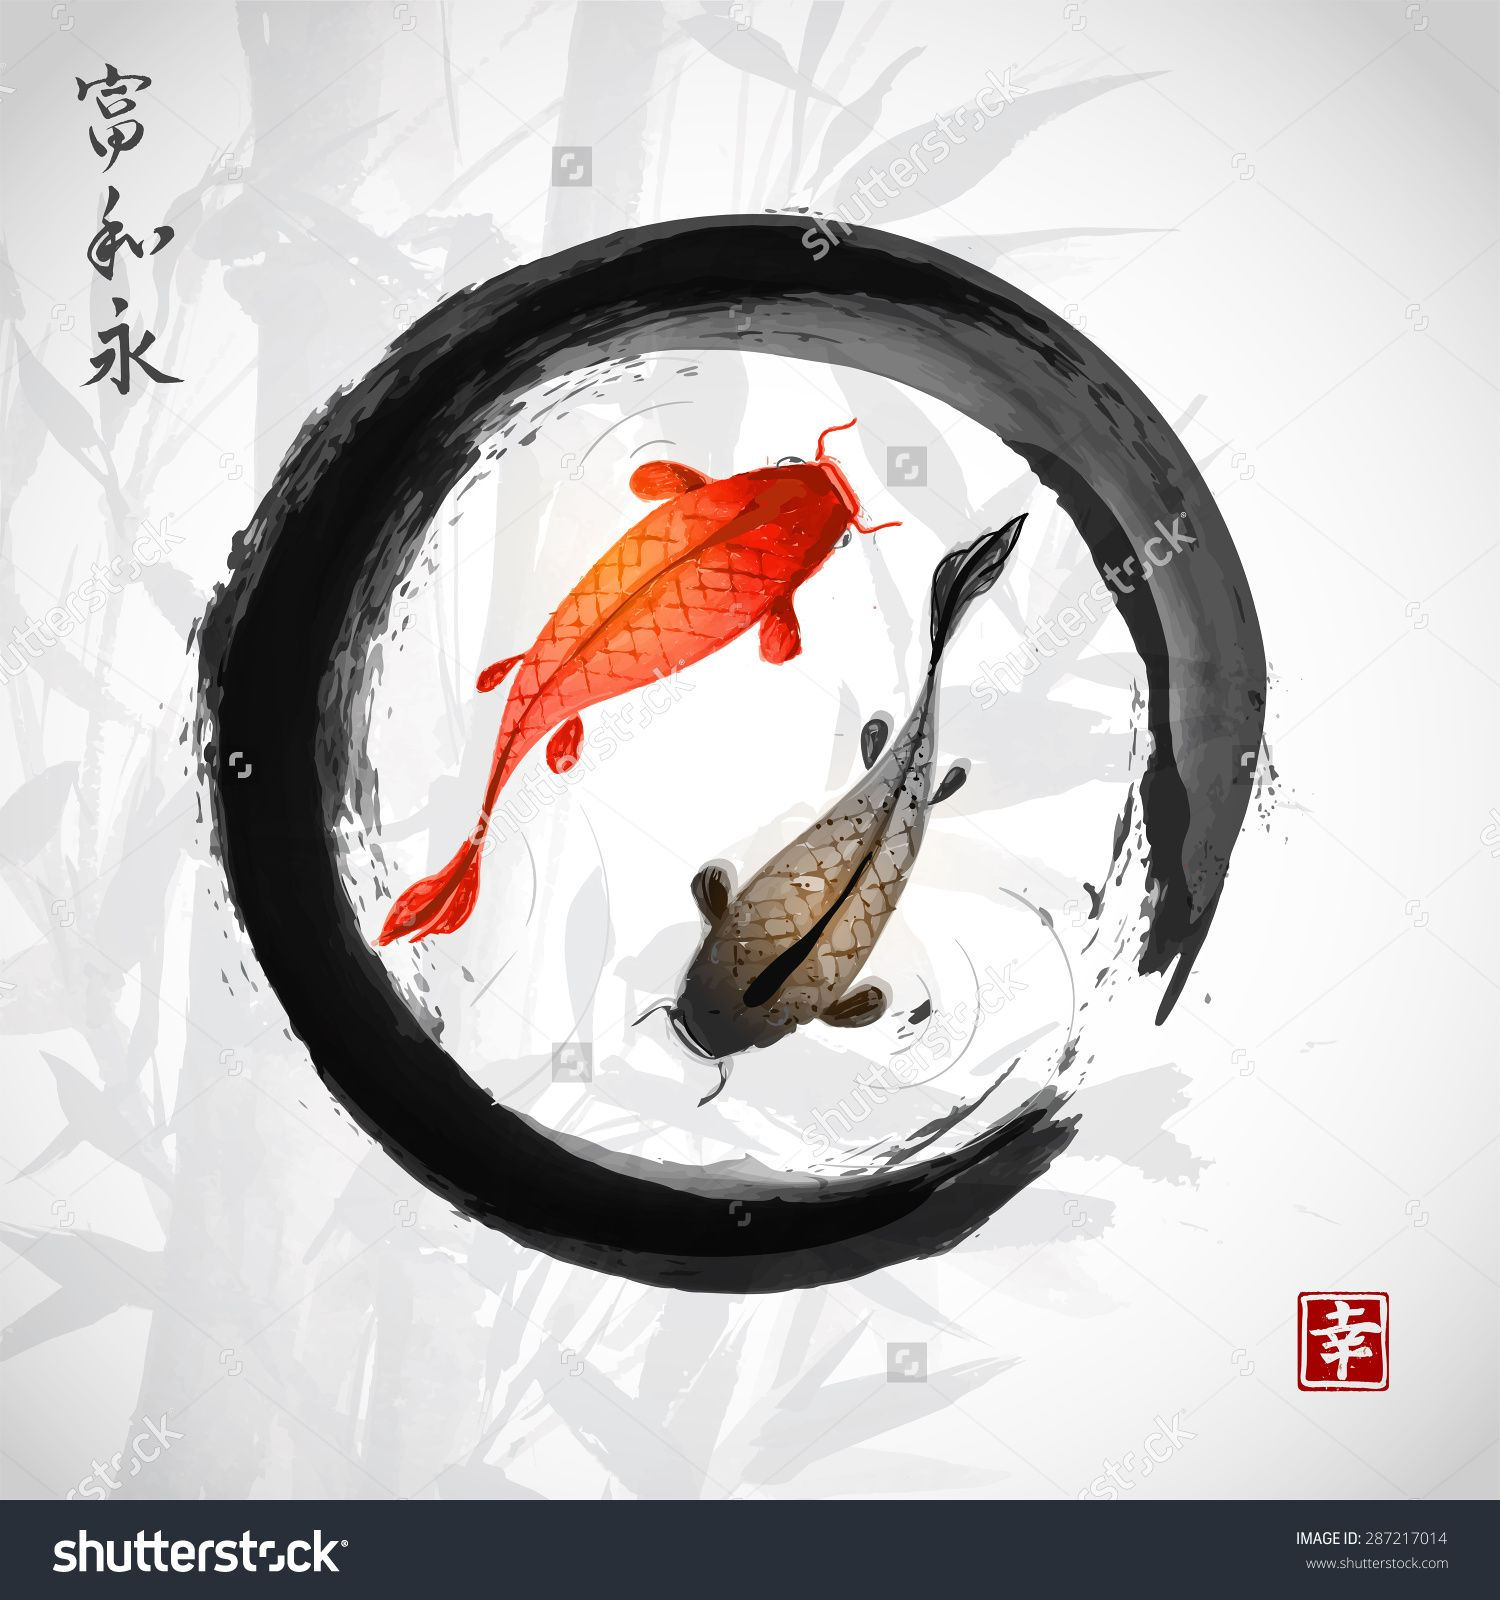 zen circle koi tattoo - Google Search